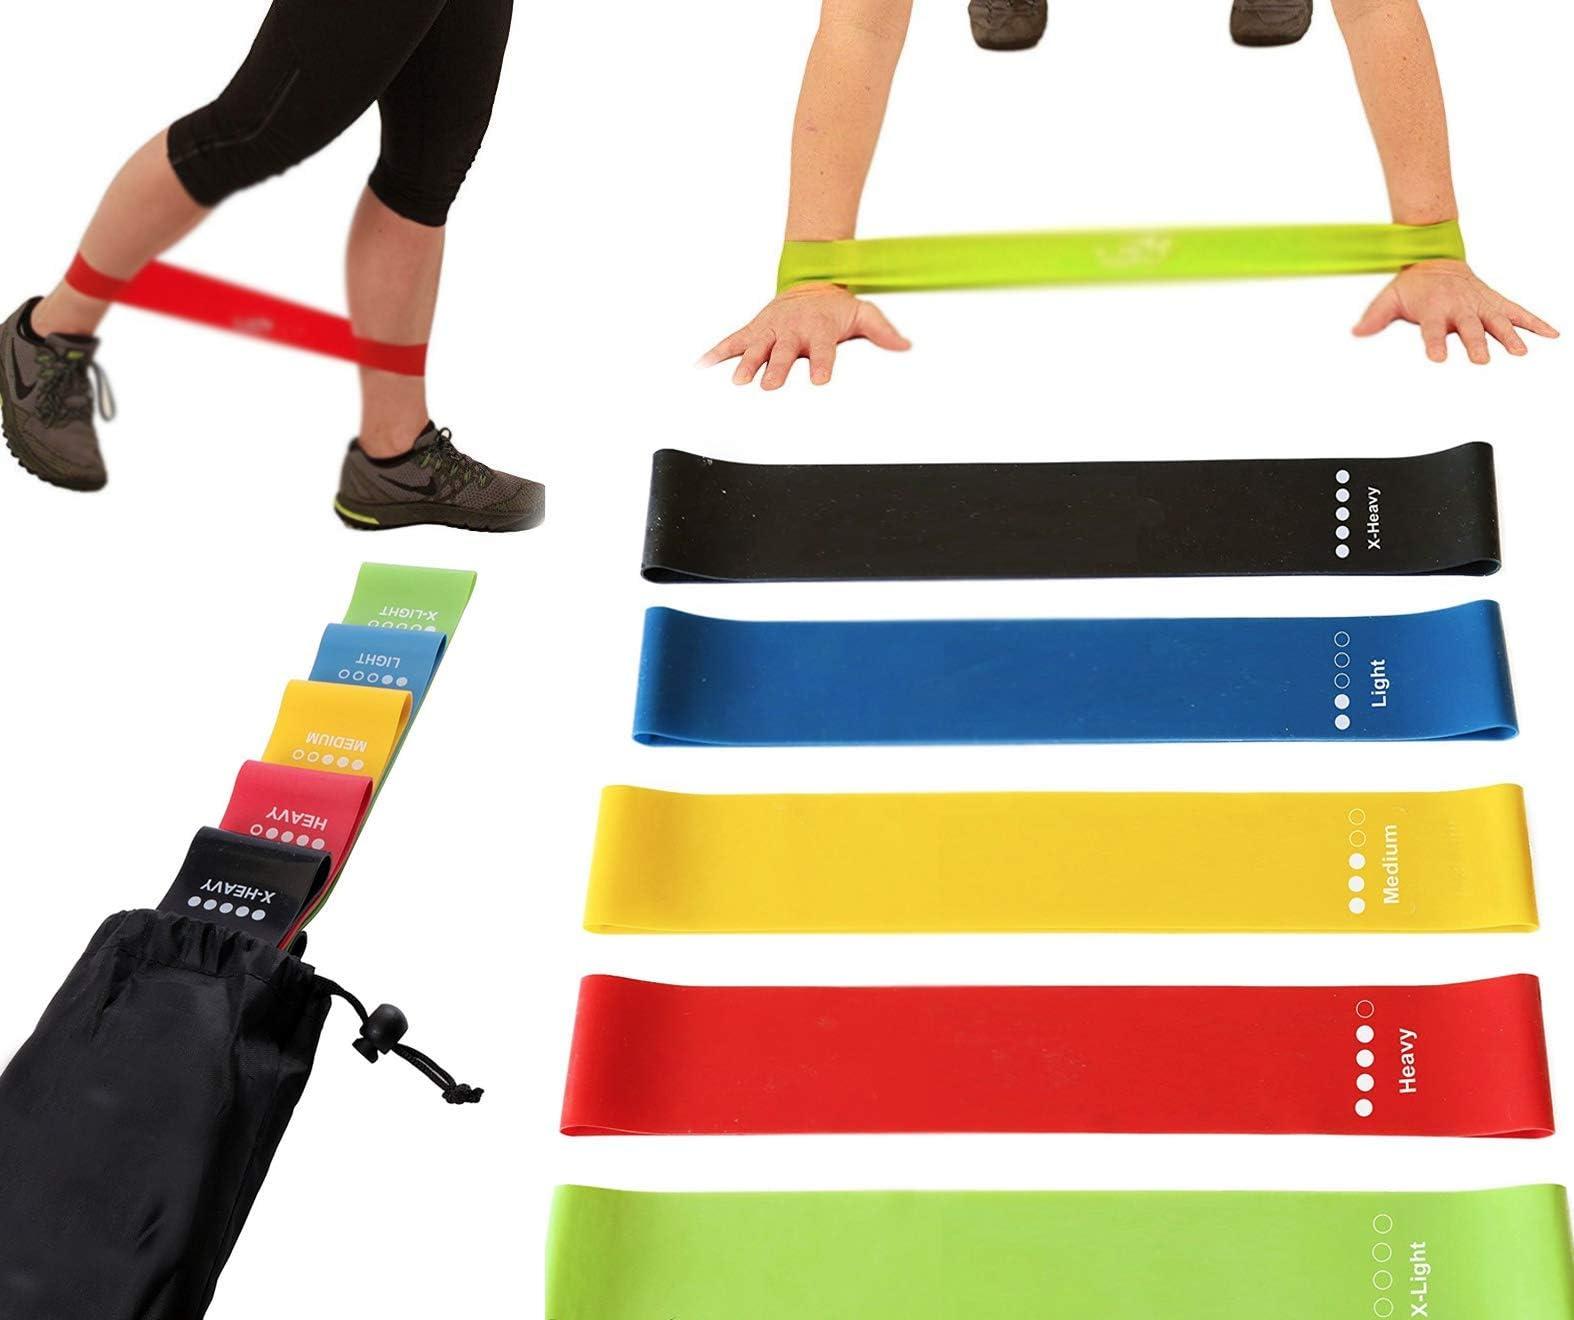 Resistance loop bands 5 Set Workout Strength fitness Gym exercise Yoga US Seller